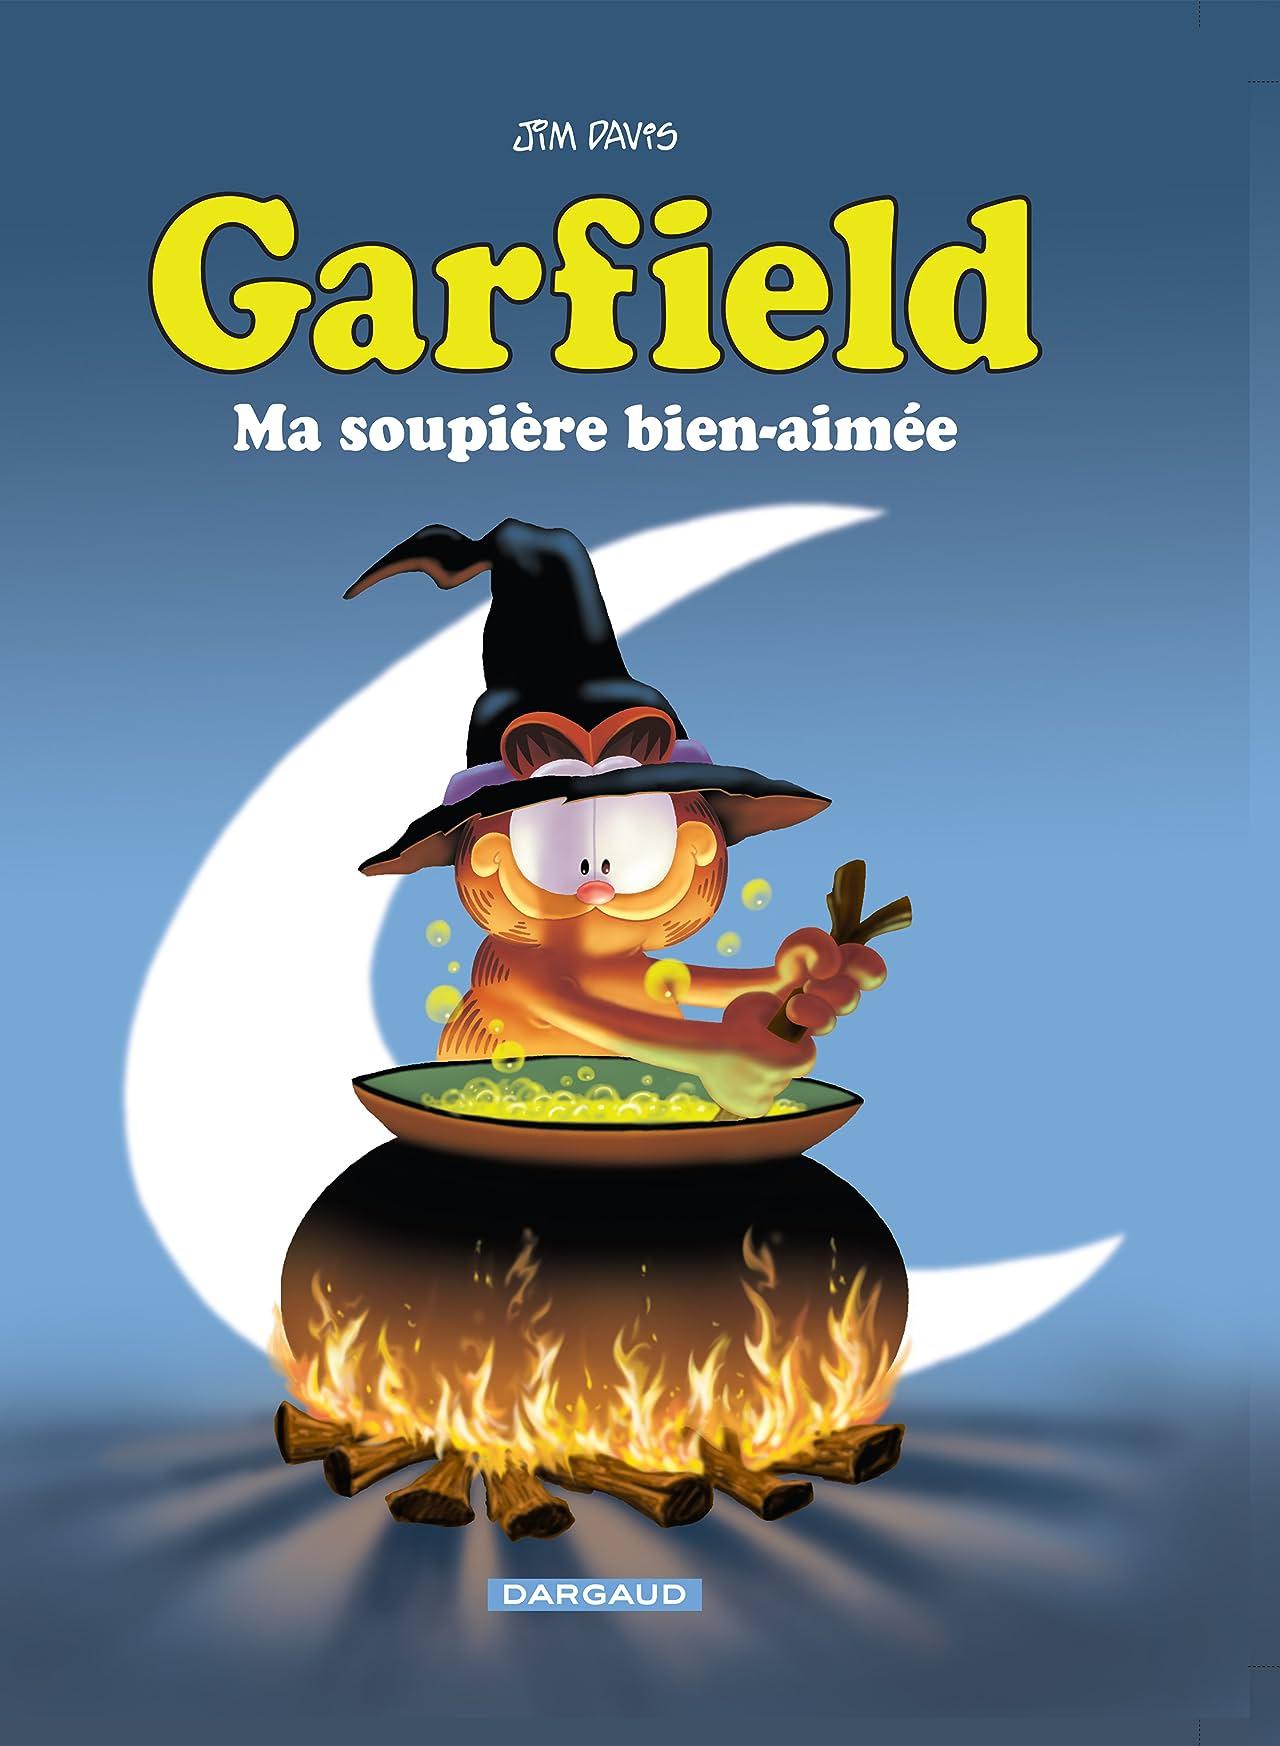 Garfield Vol. 31: Soupière bien aimée (Ma)